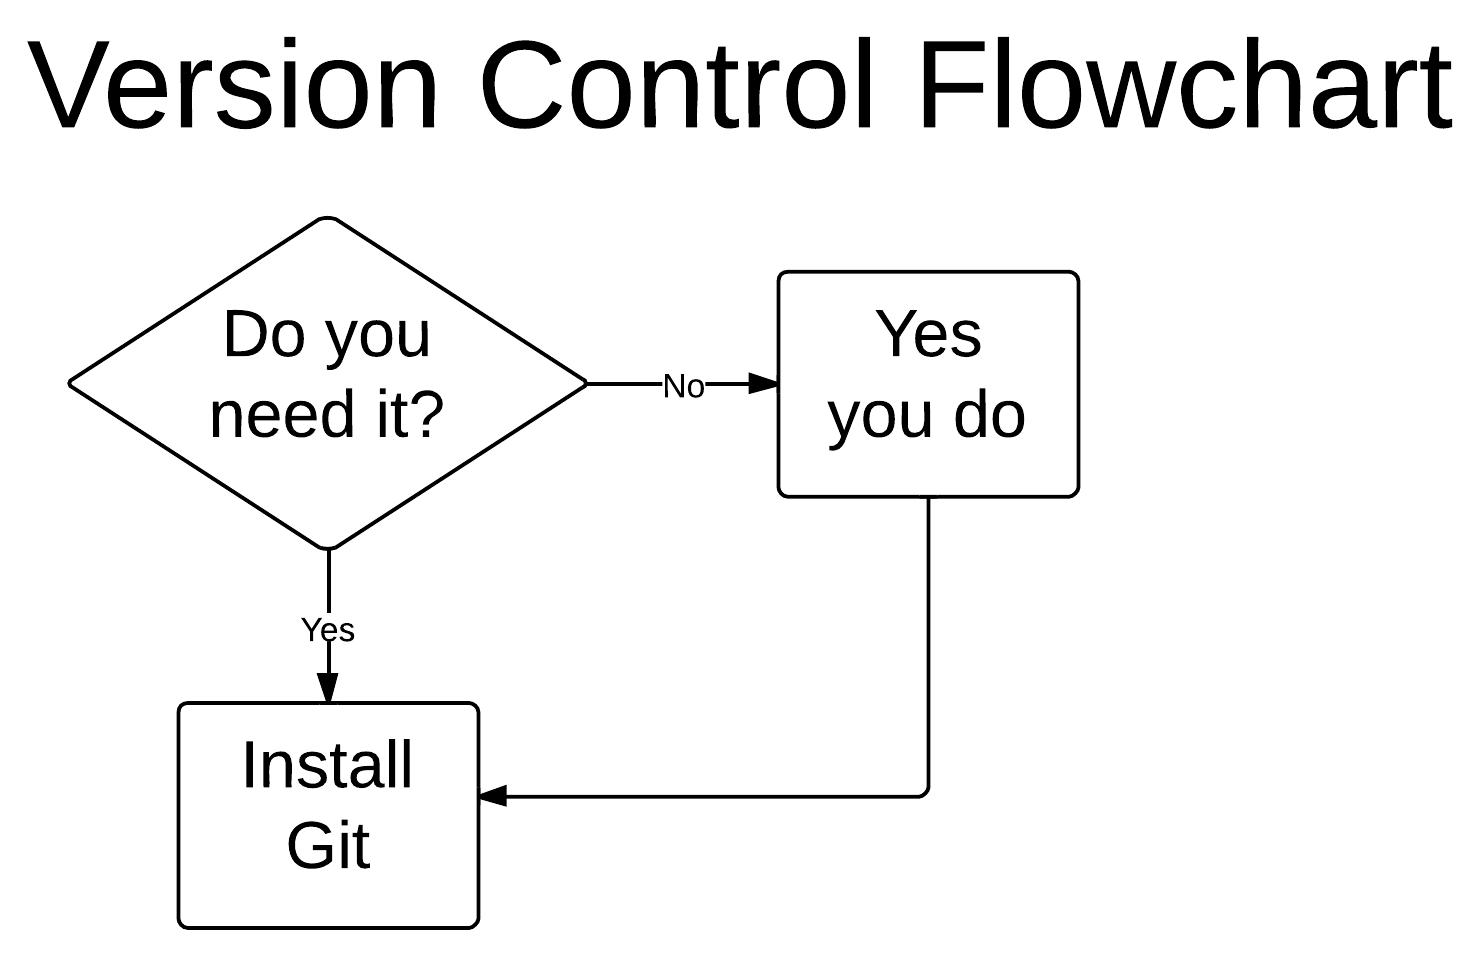 when to install git flowchart